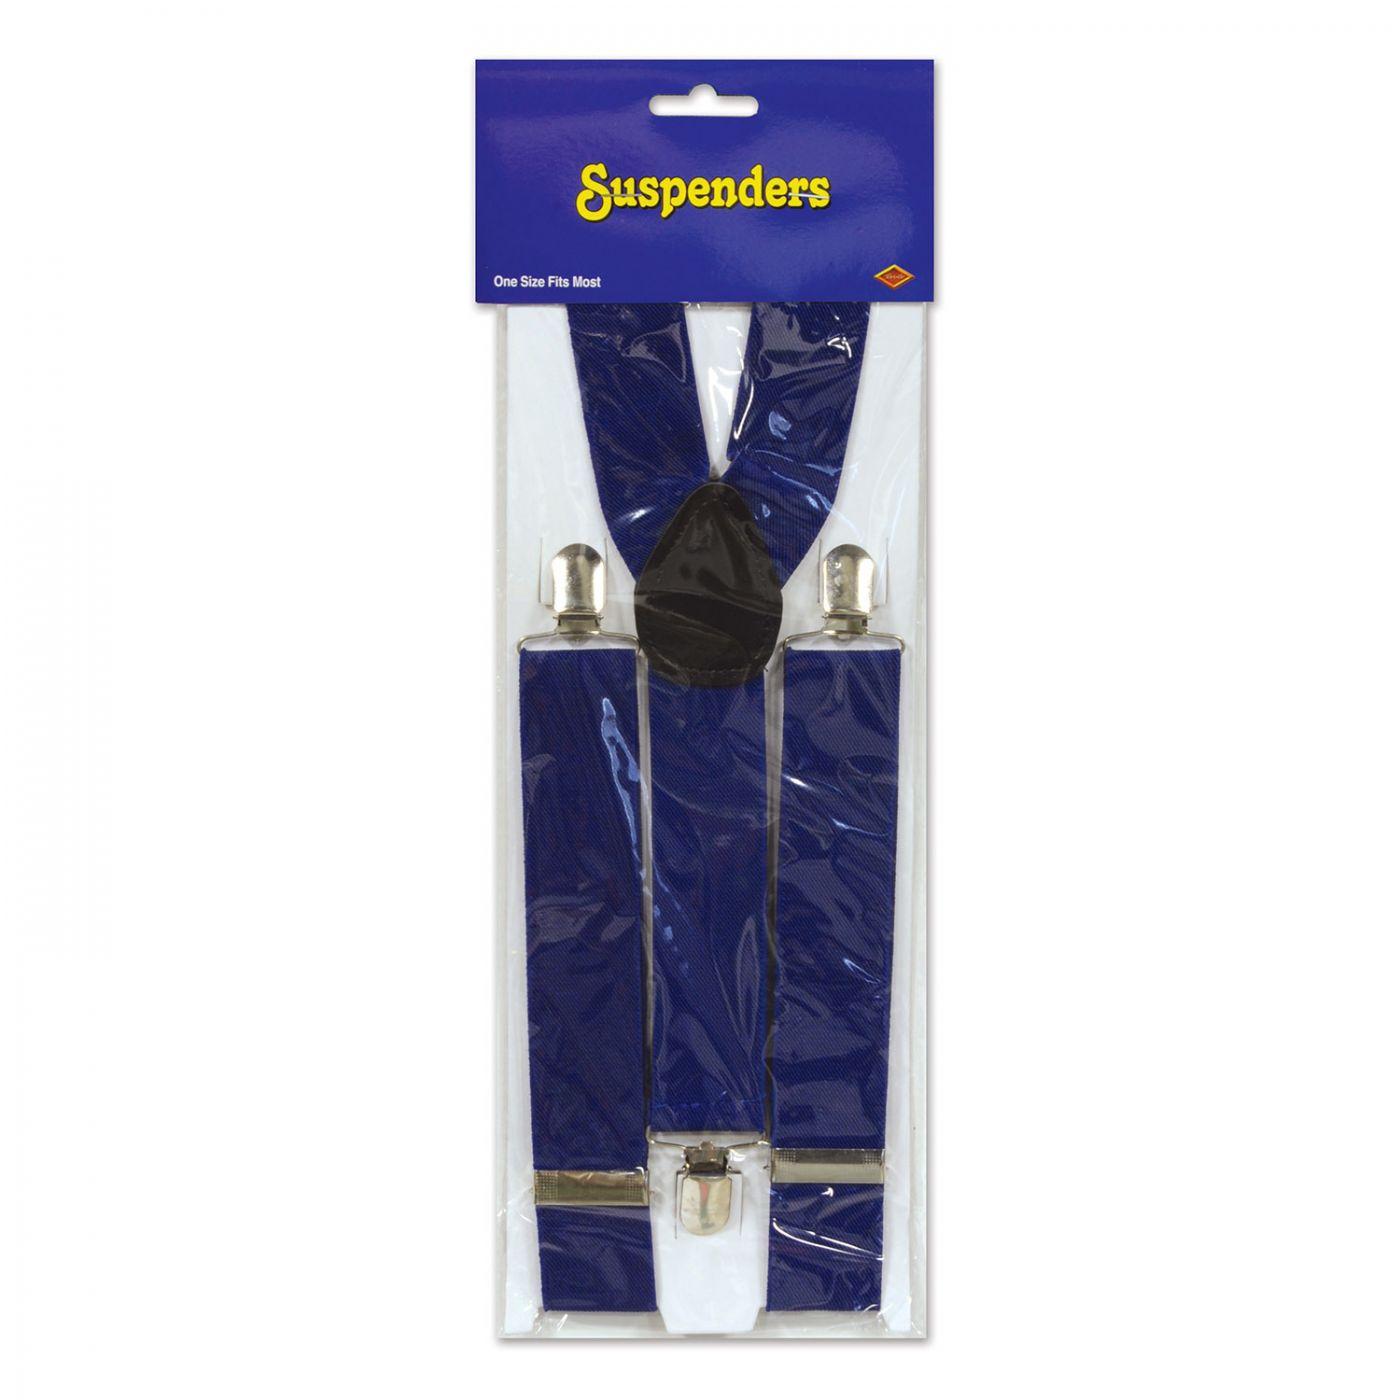 Blue Suspenders image